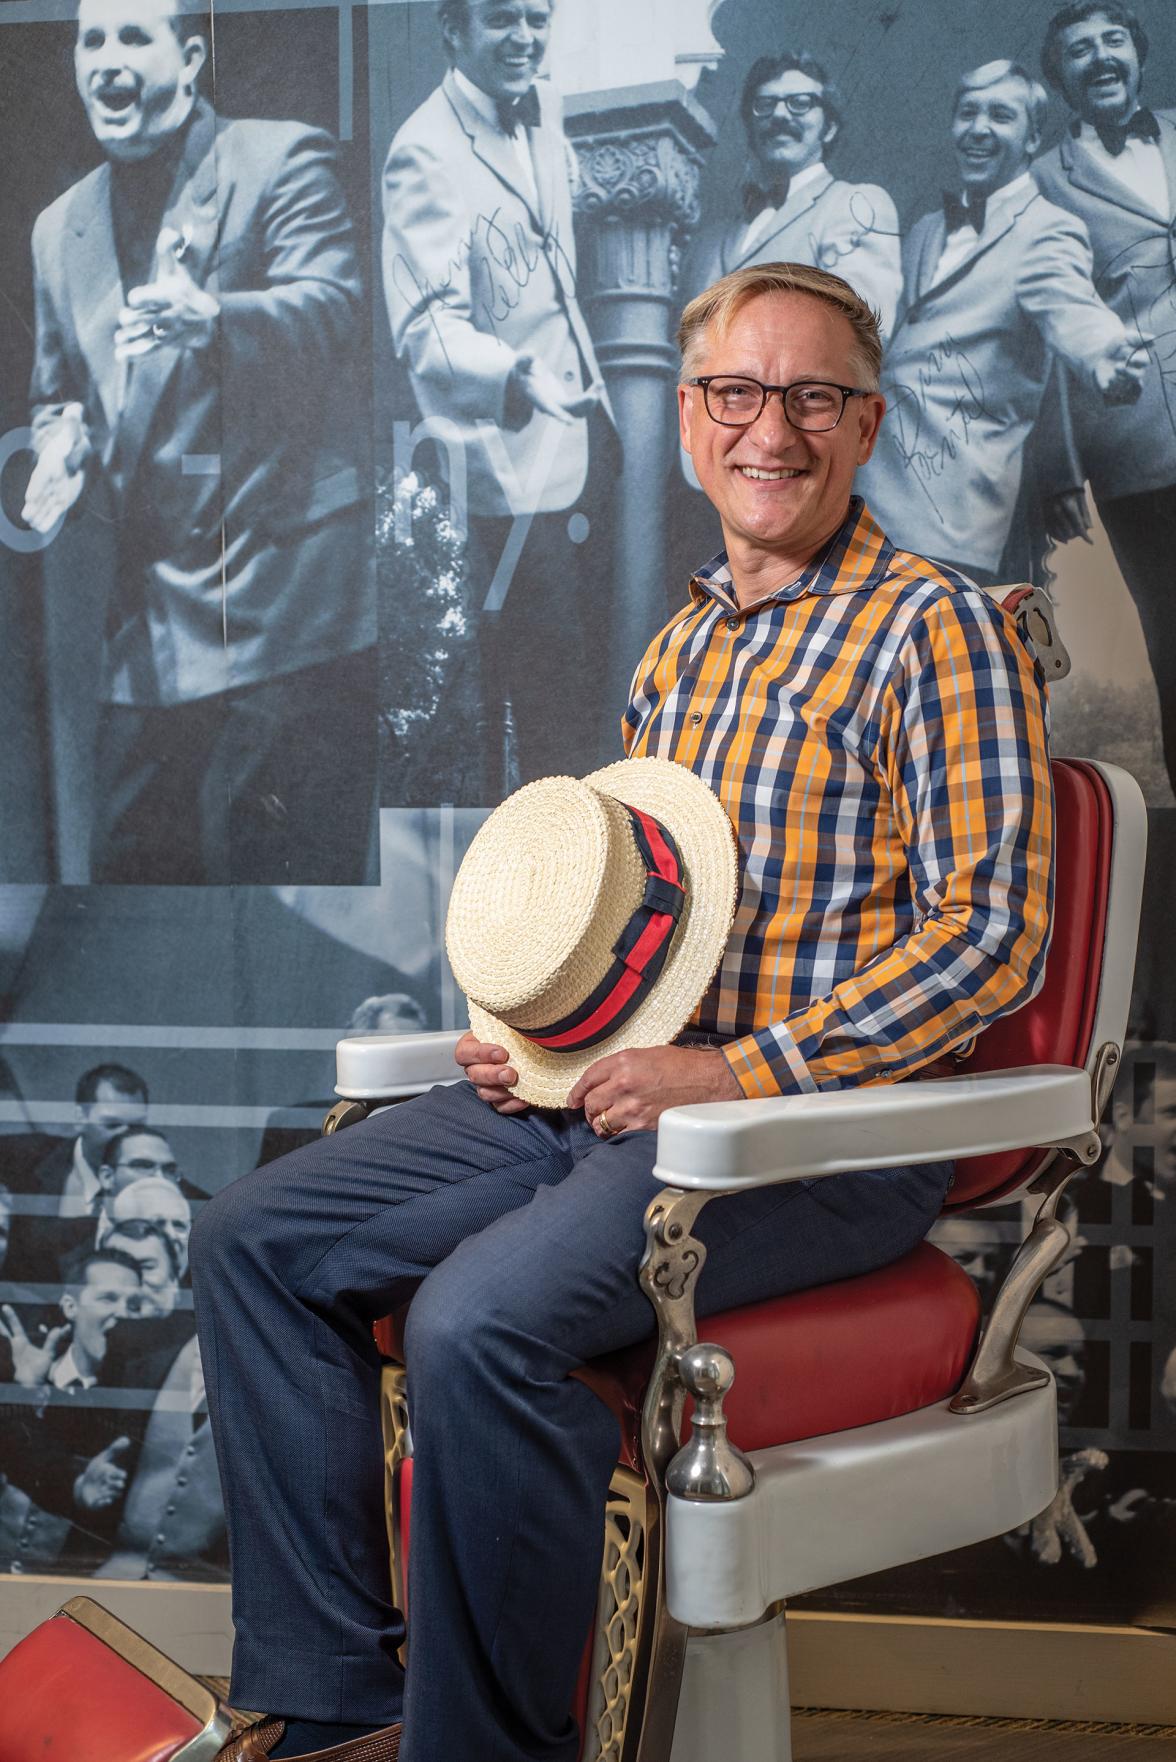 Nashville Byline: The Barbershop Harmony Society